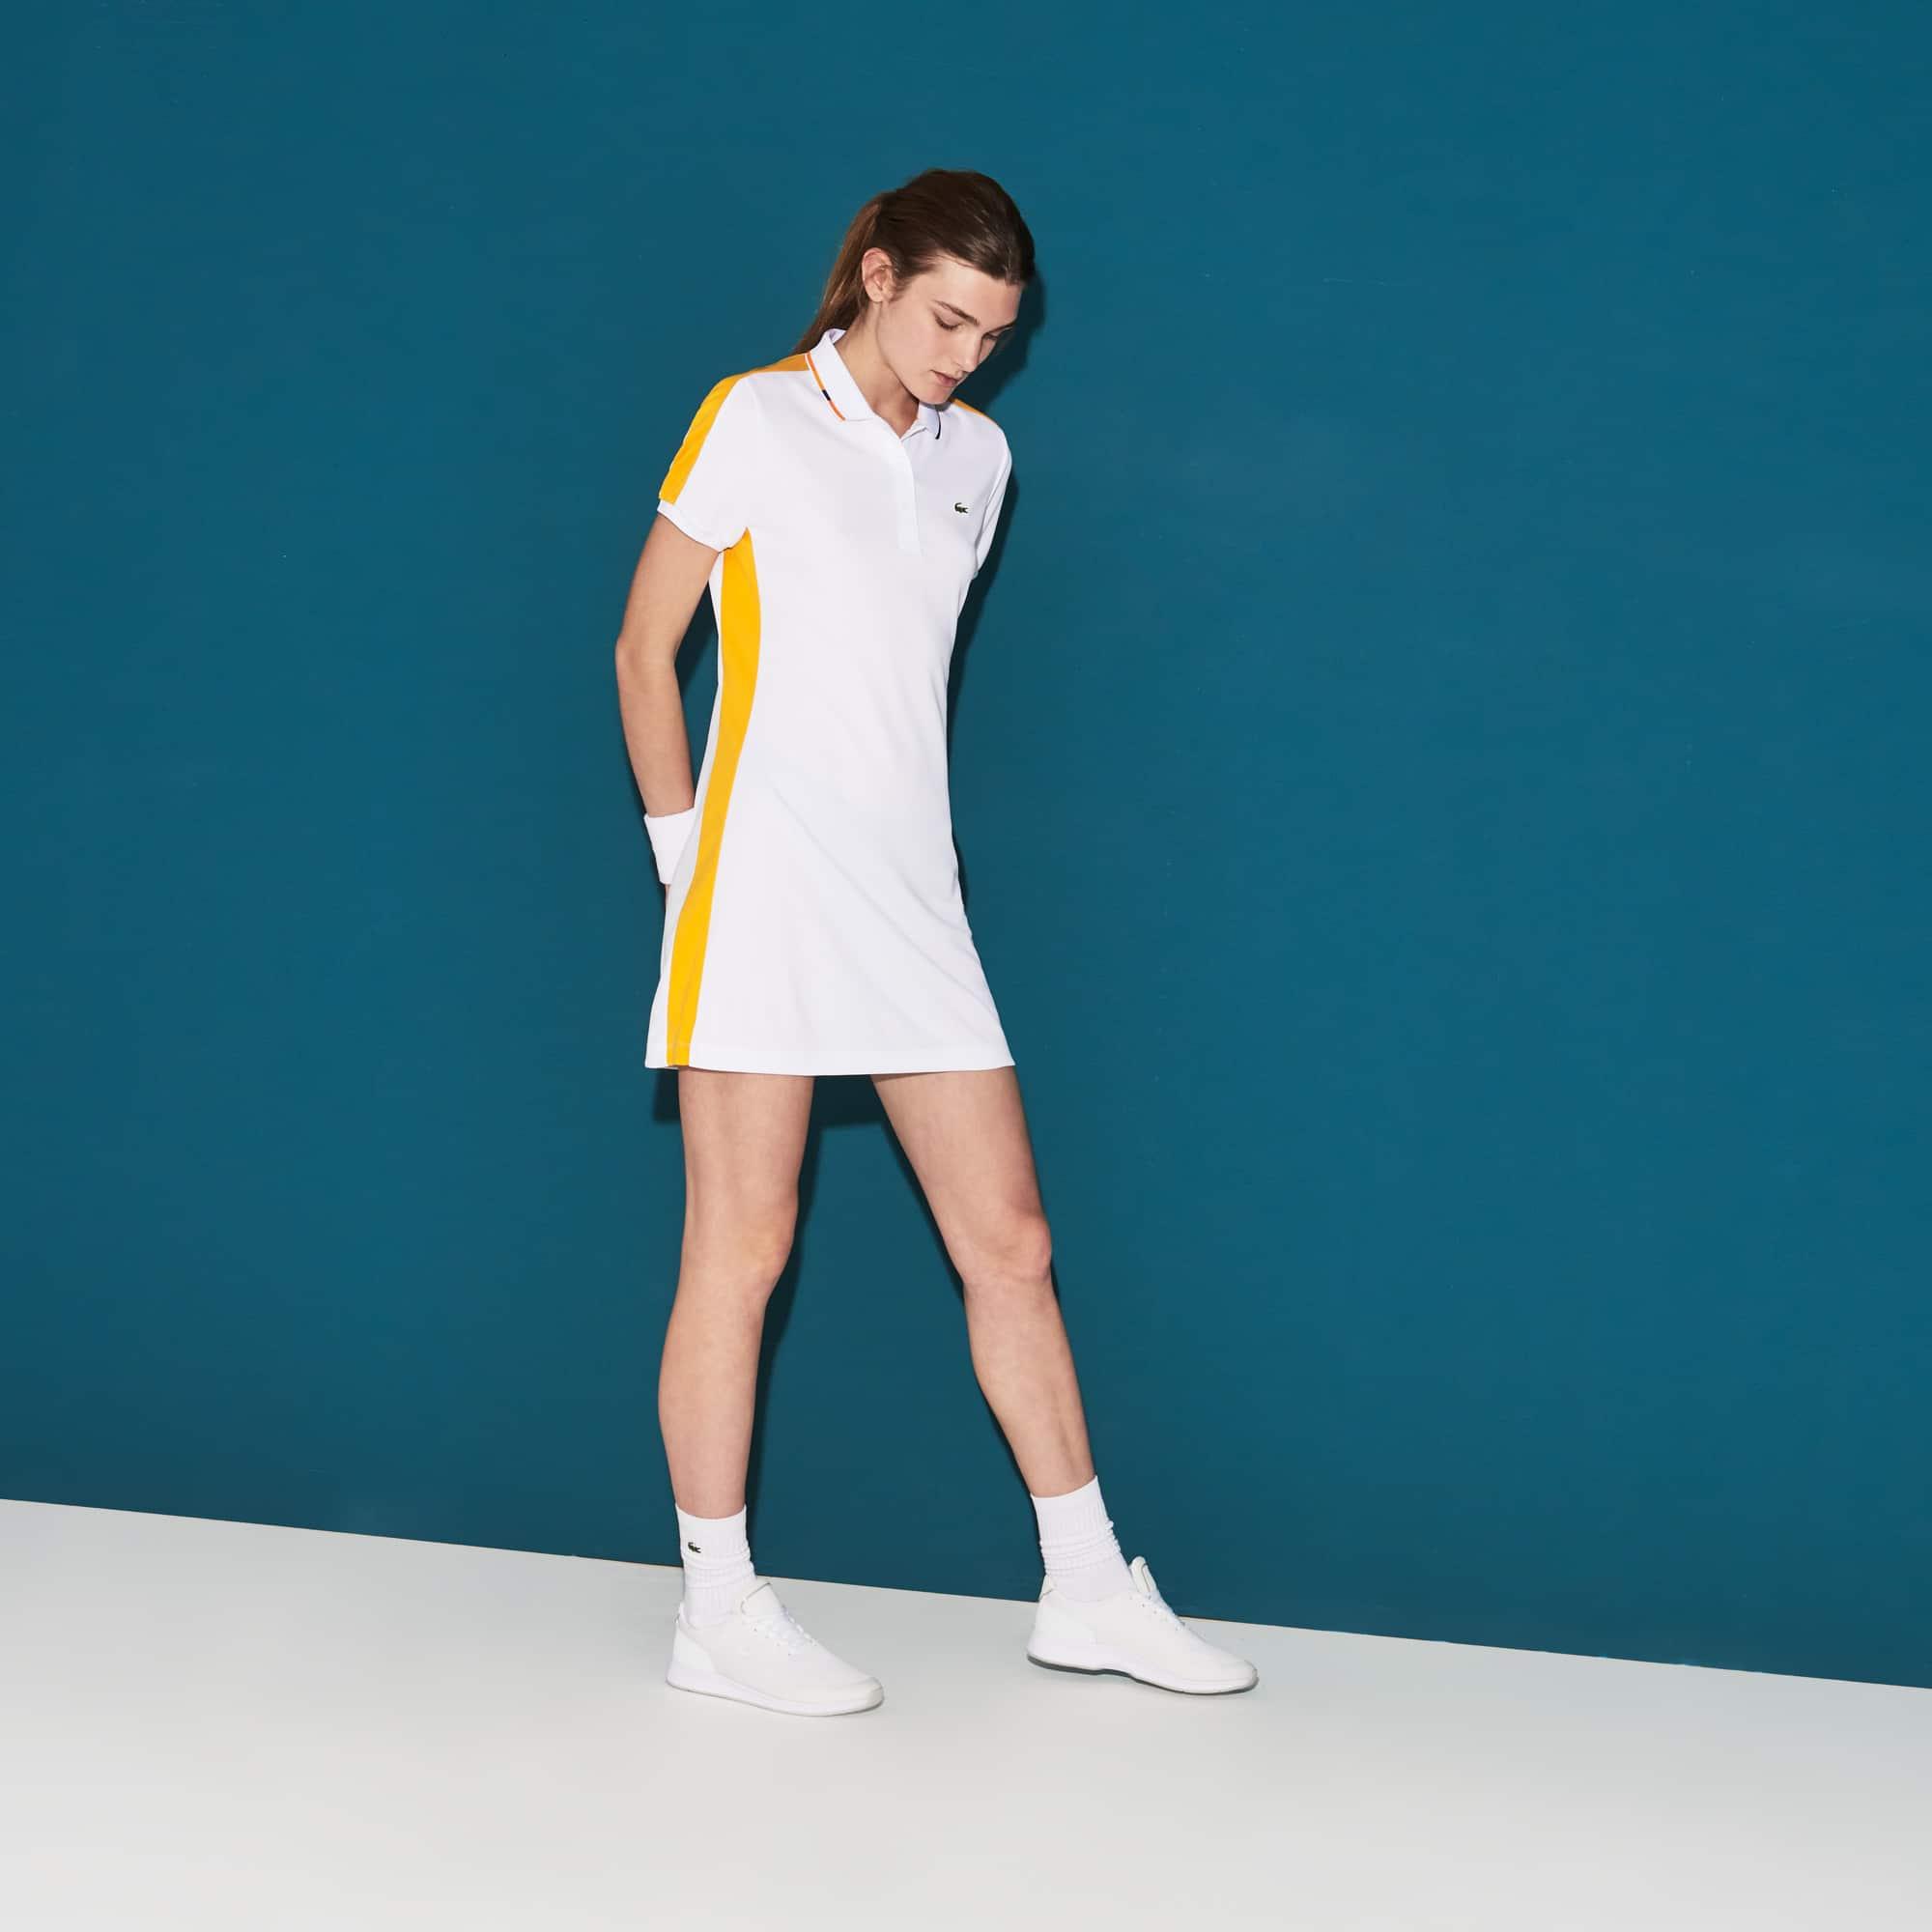 Damen LACOSTE SPORT Tennis-Polokleid mit Kontraststreifen